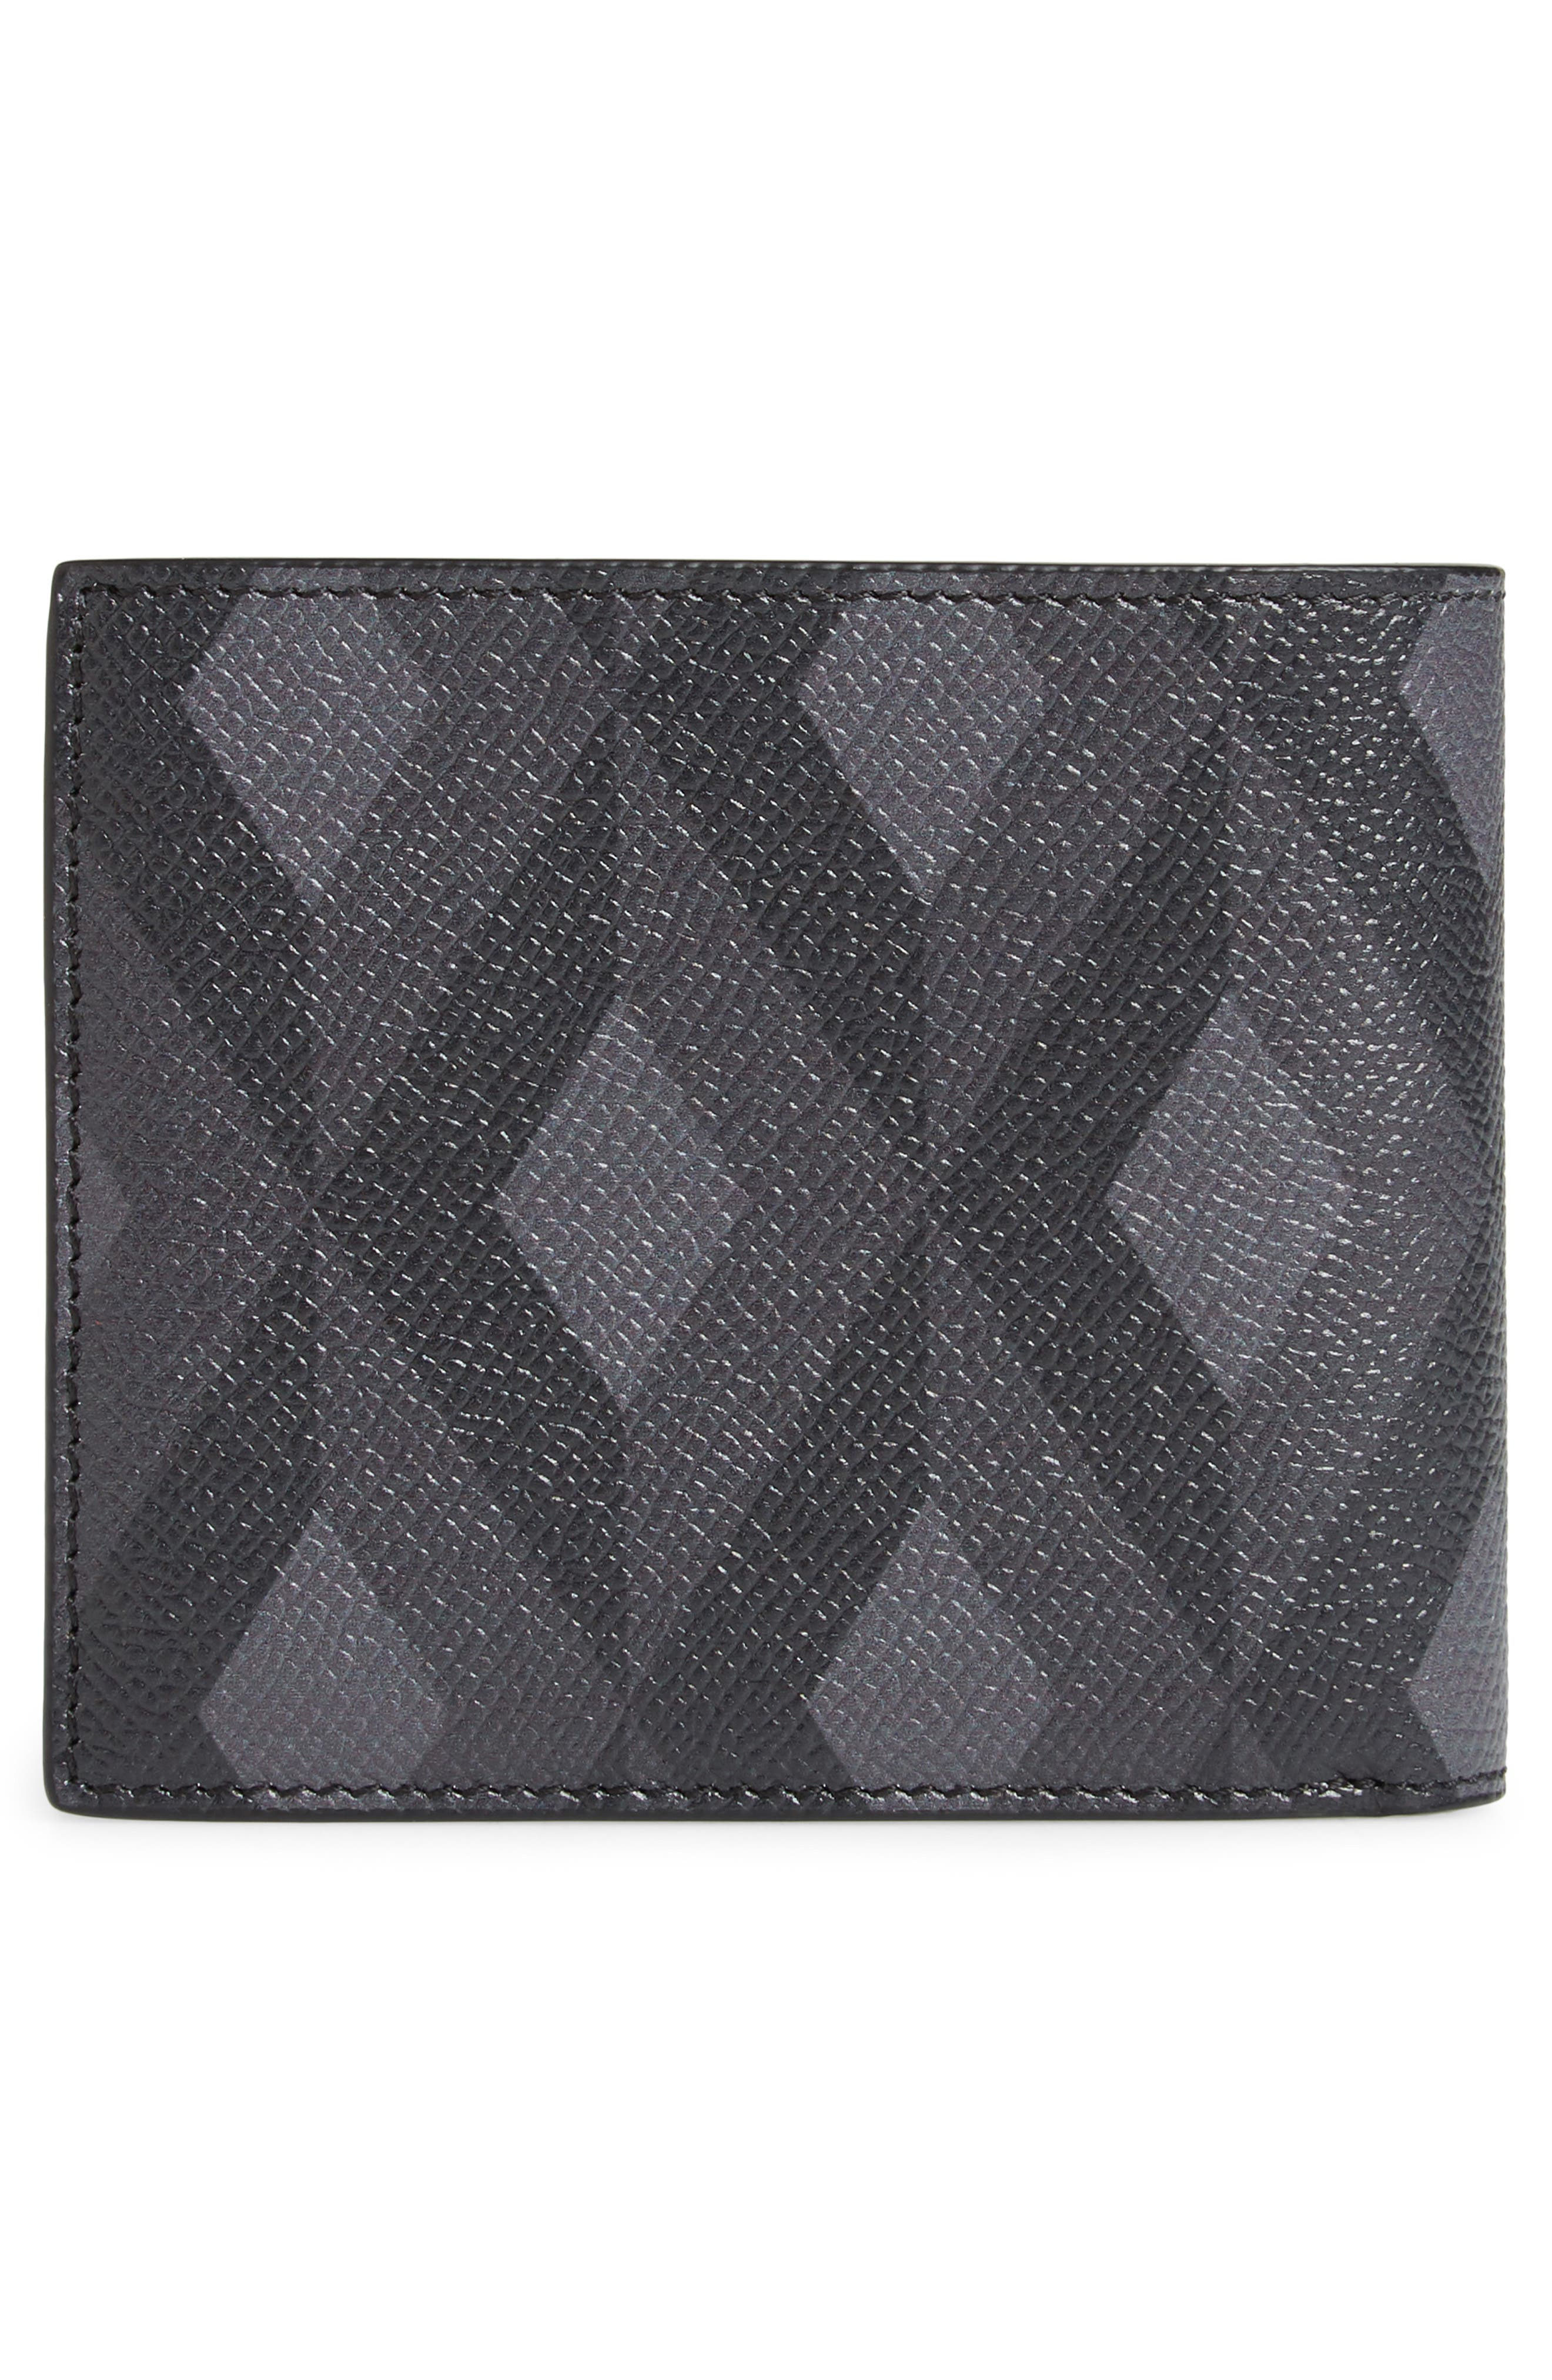 Cadogan Leather Wallet,                             Alternate thumbnail 3, color,                             020